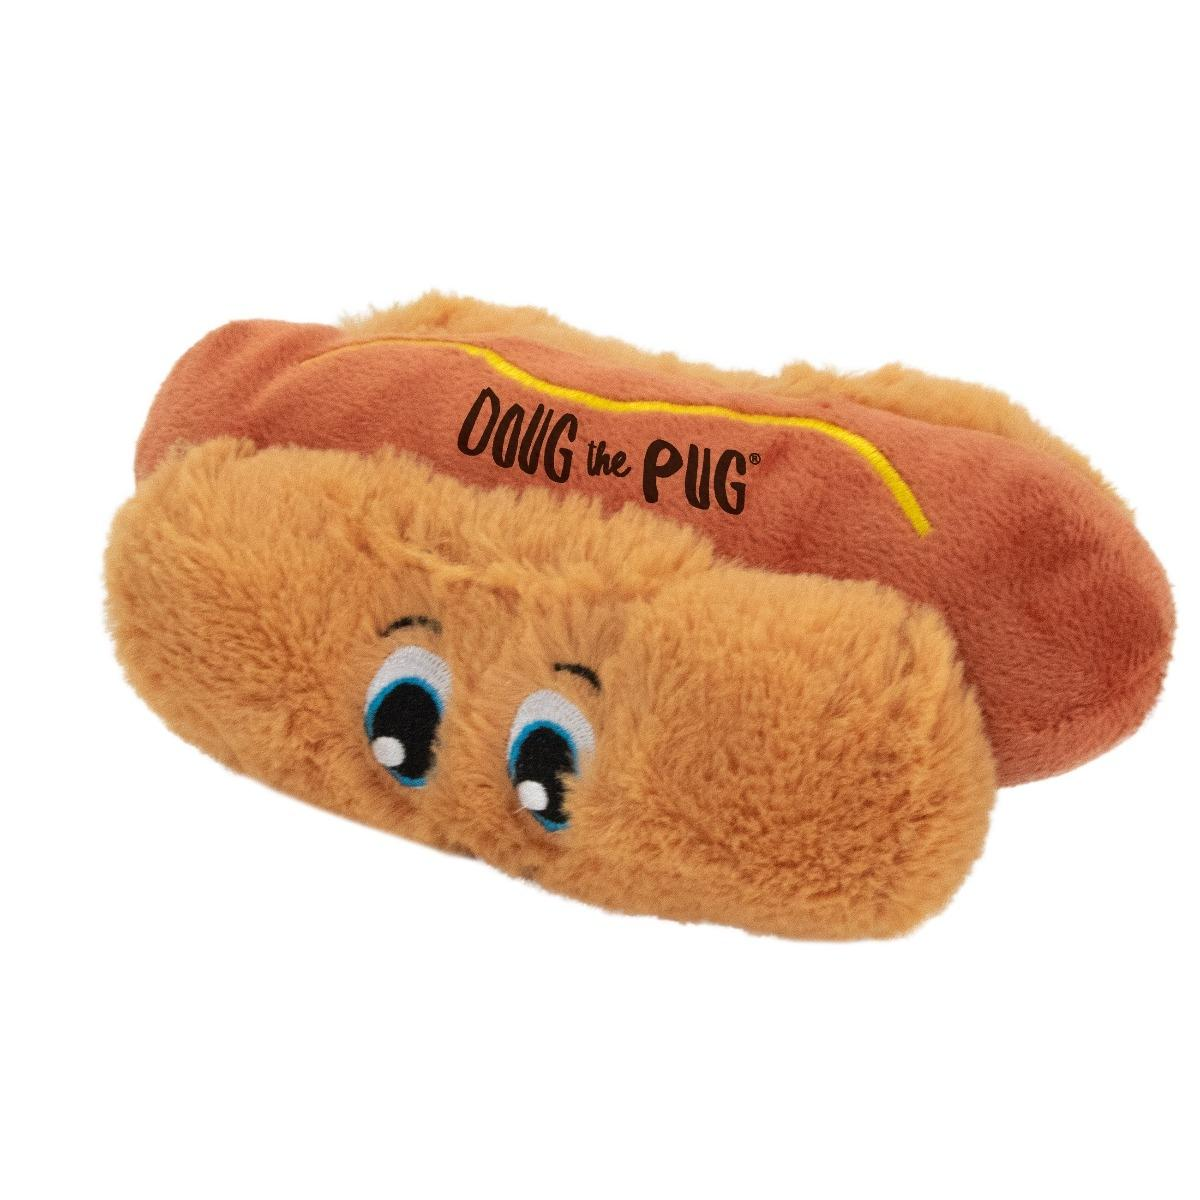 Incrediplush Doug the Pug Dog Toy - Hot Dog